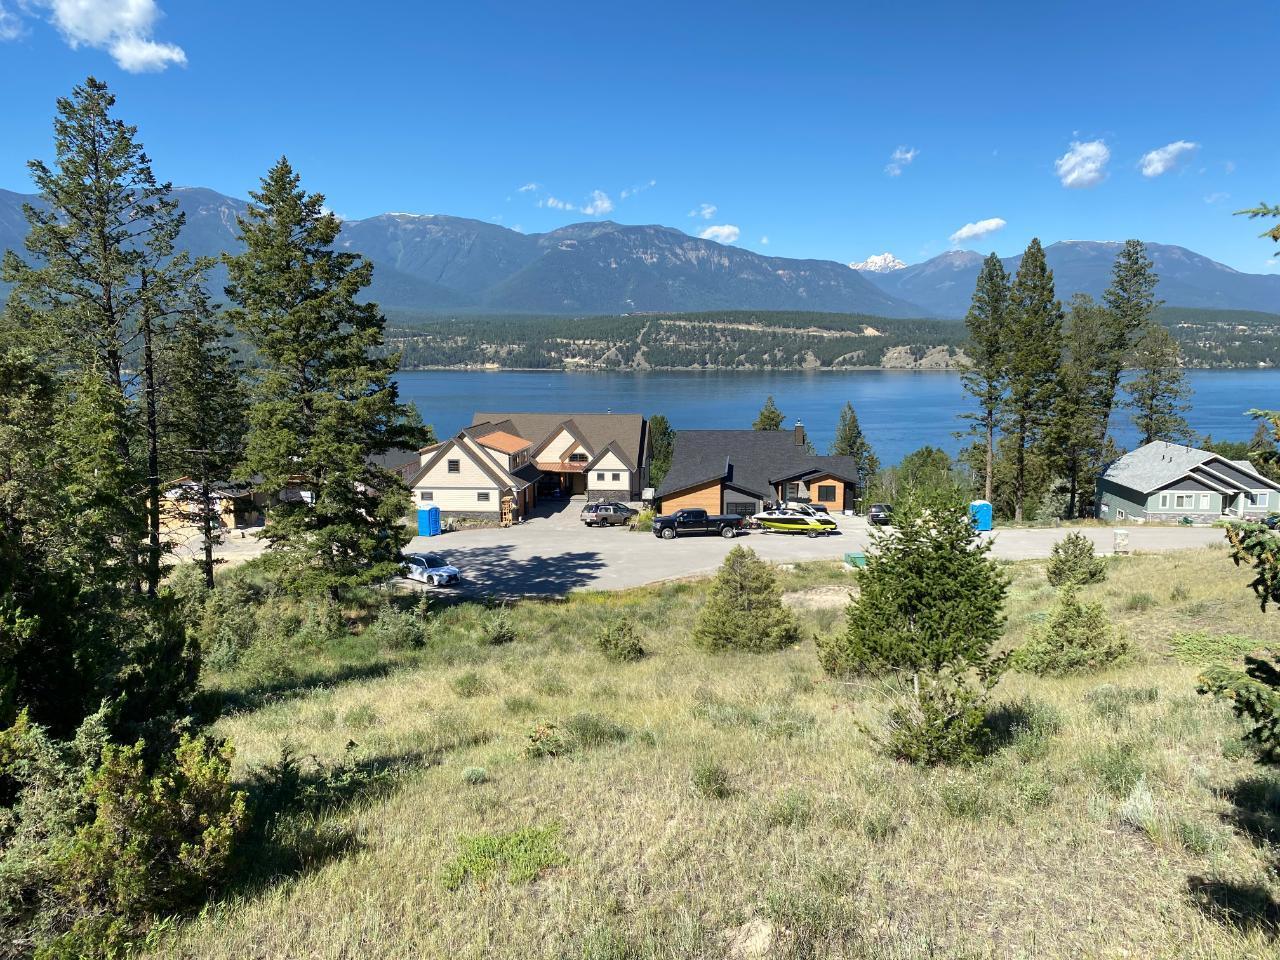 Lot 5 Stoddart Estates Drive, Windermere, British Columbia  V0B 2L0 - Photo 1 - 2451192